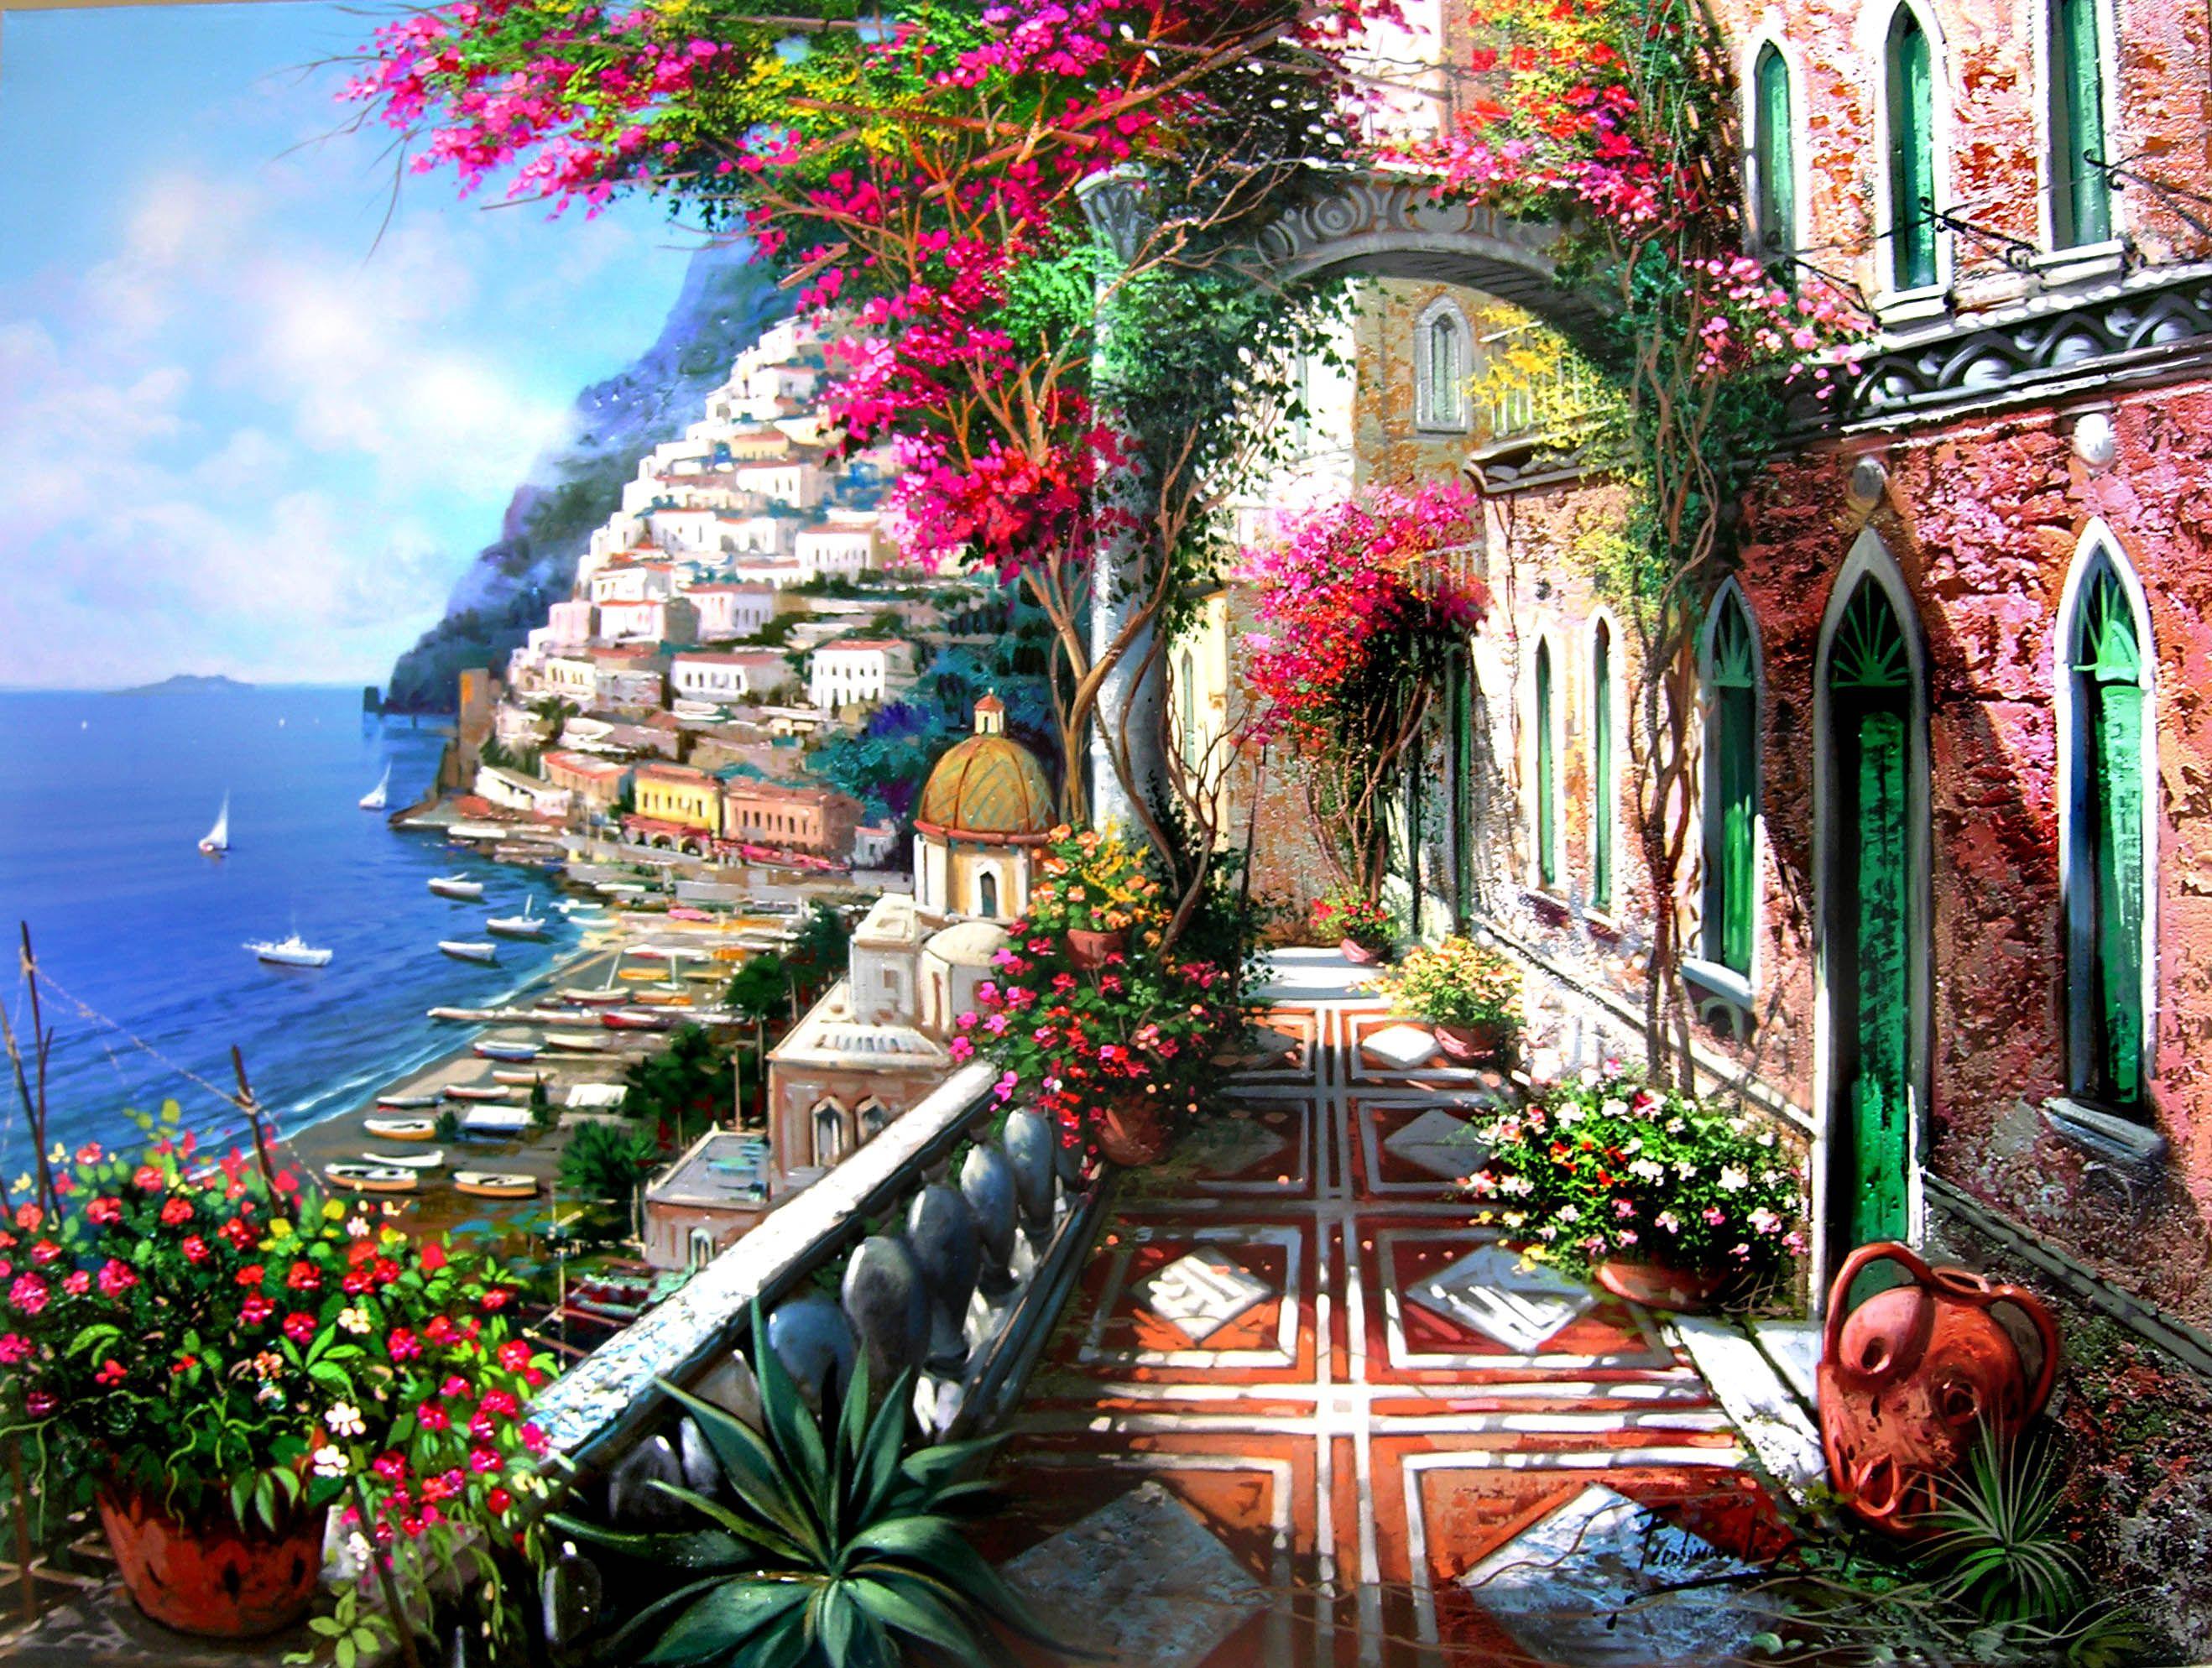 Sedna galleria d 39 arte vendita online dipinti for Vendita dipinti online